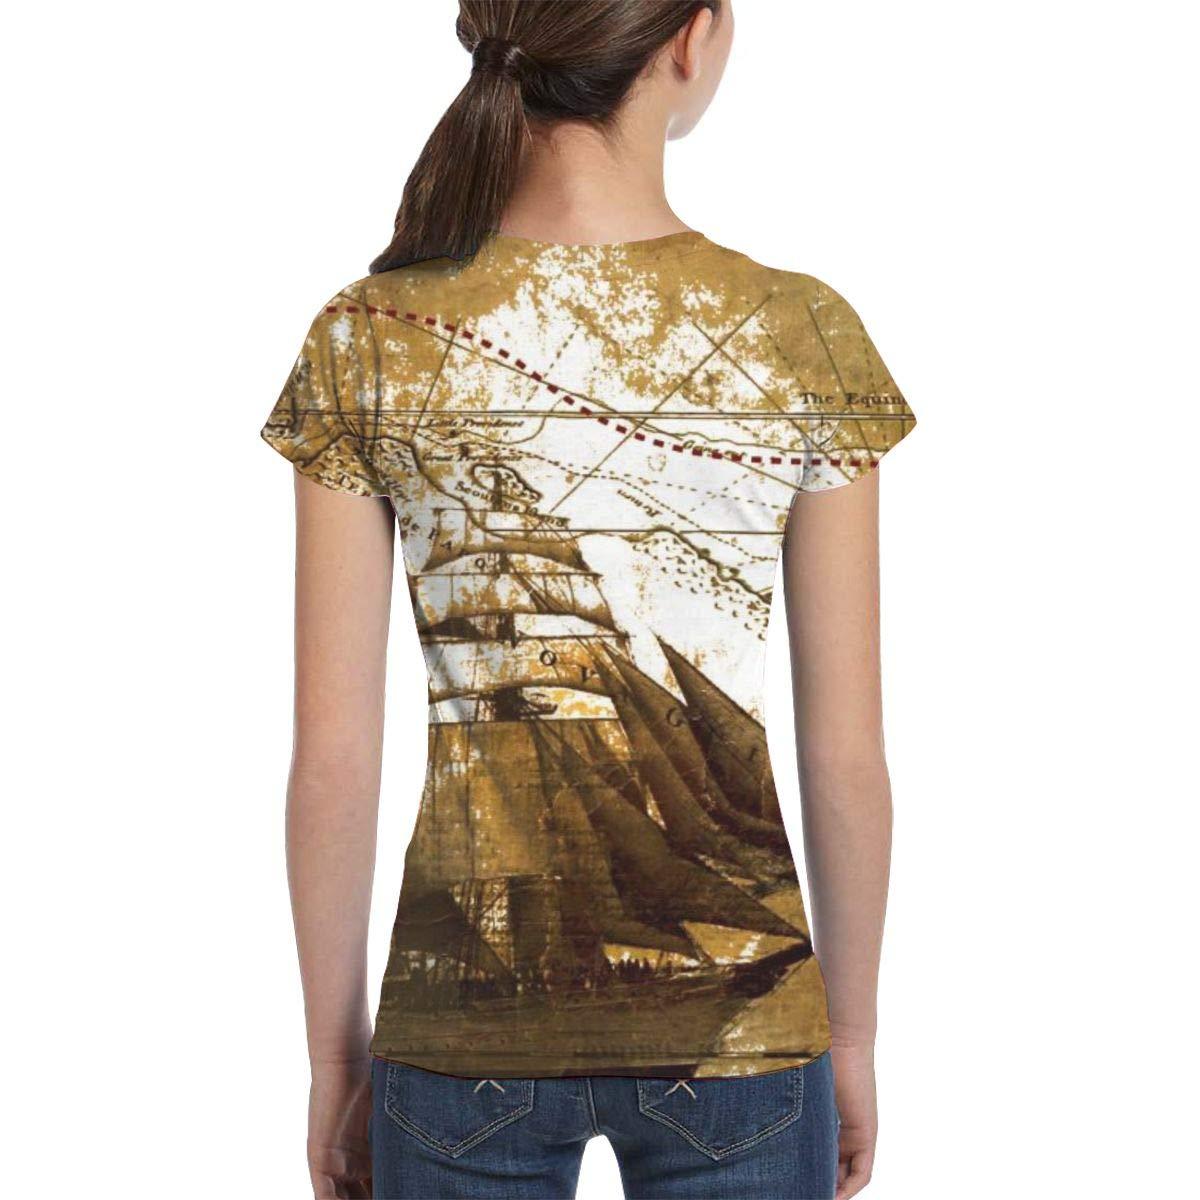 Fashion Blouse Clothes Girls Short Sleeve Nautical Vintage Sailing Pirate Ship T-Shirts XS-XL